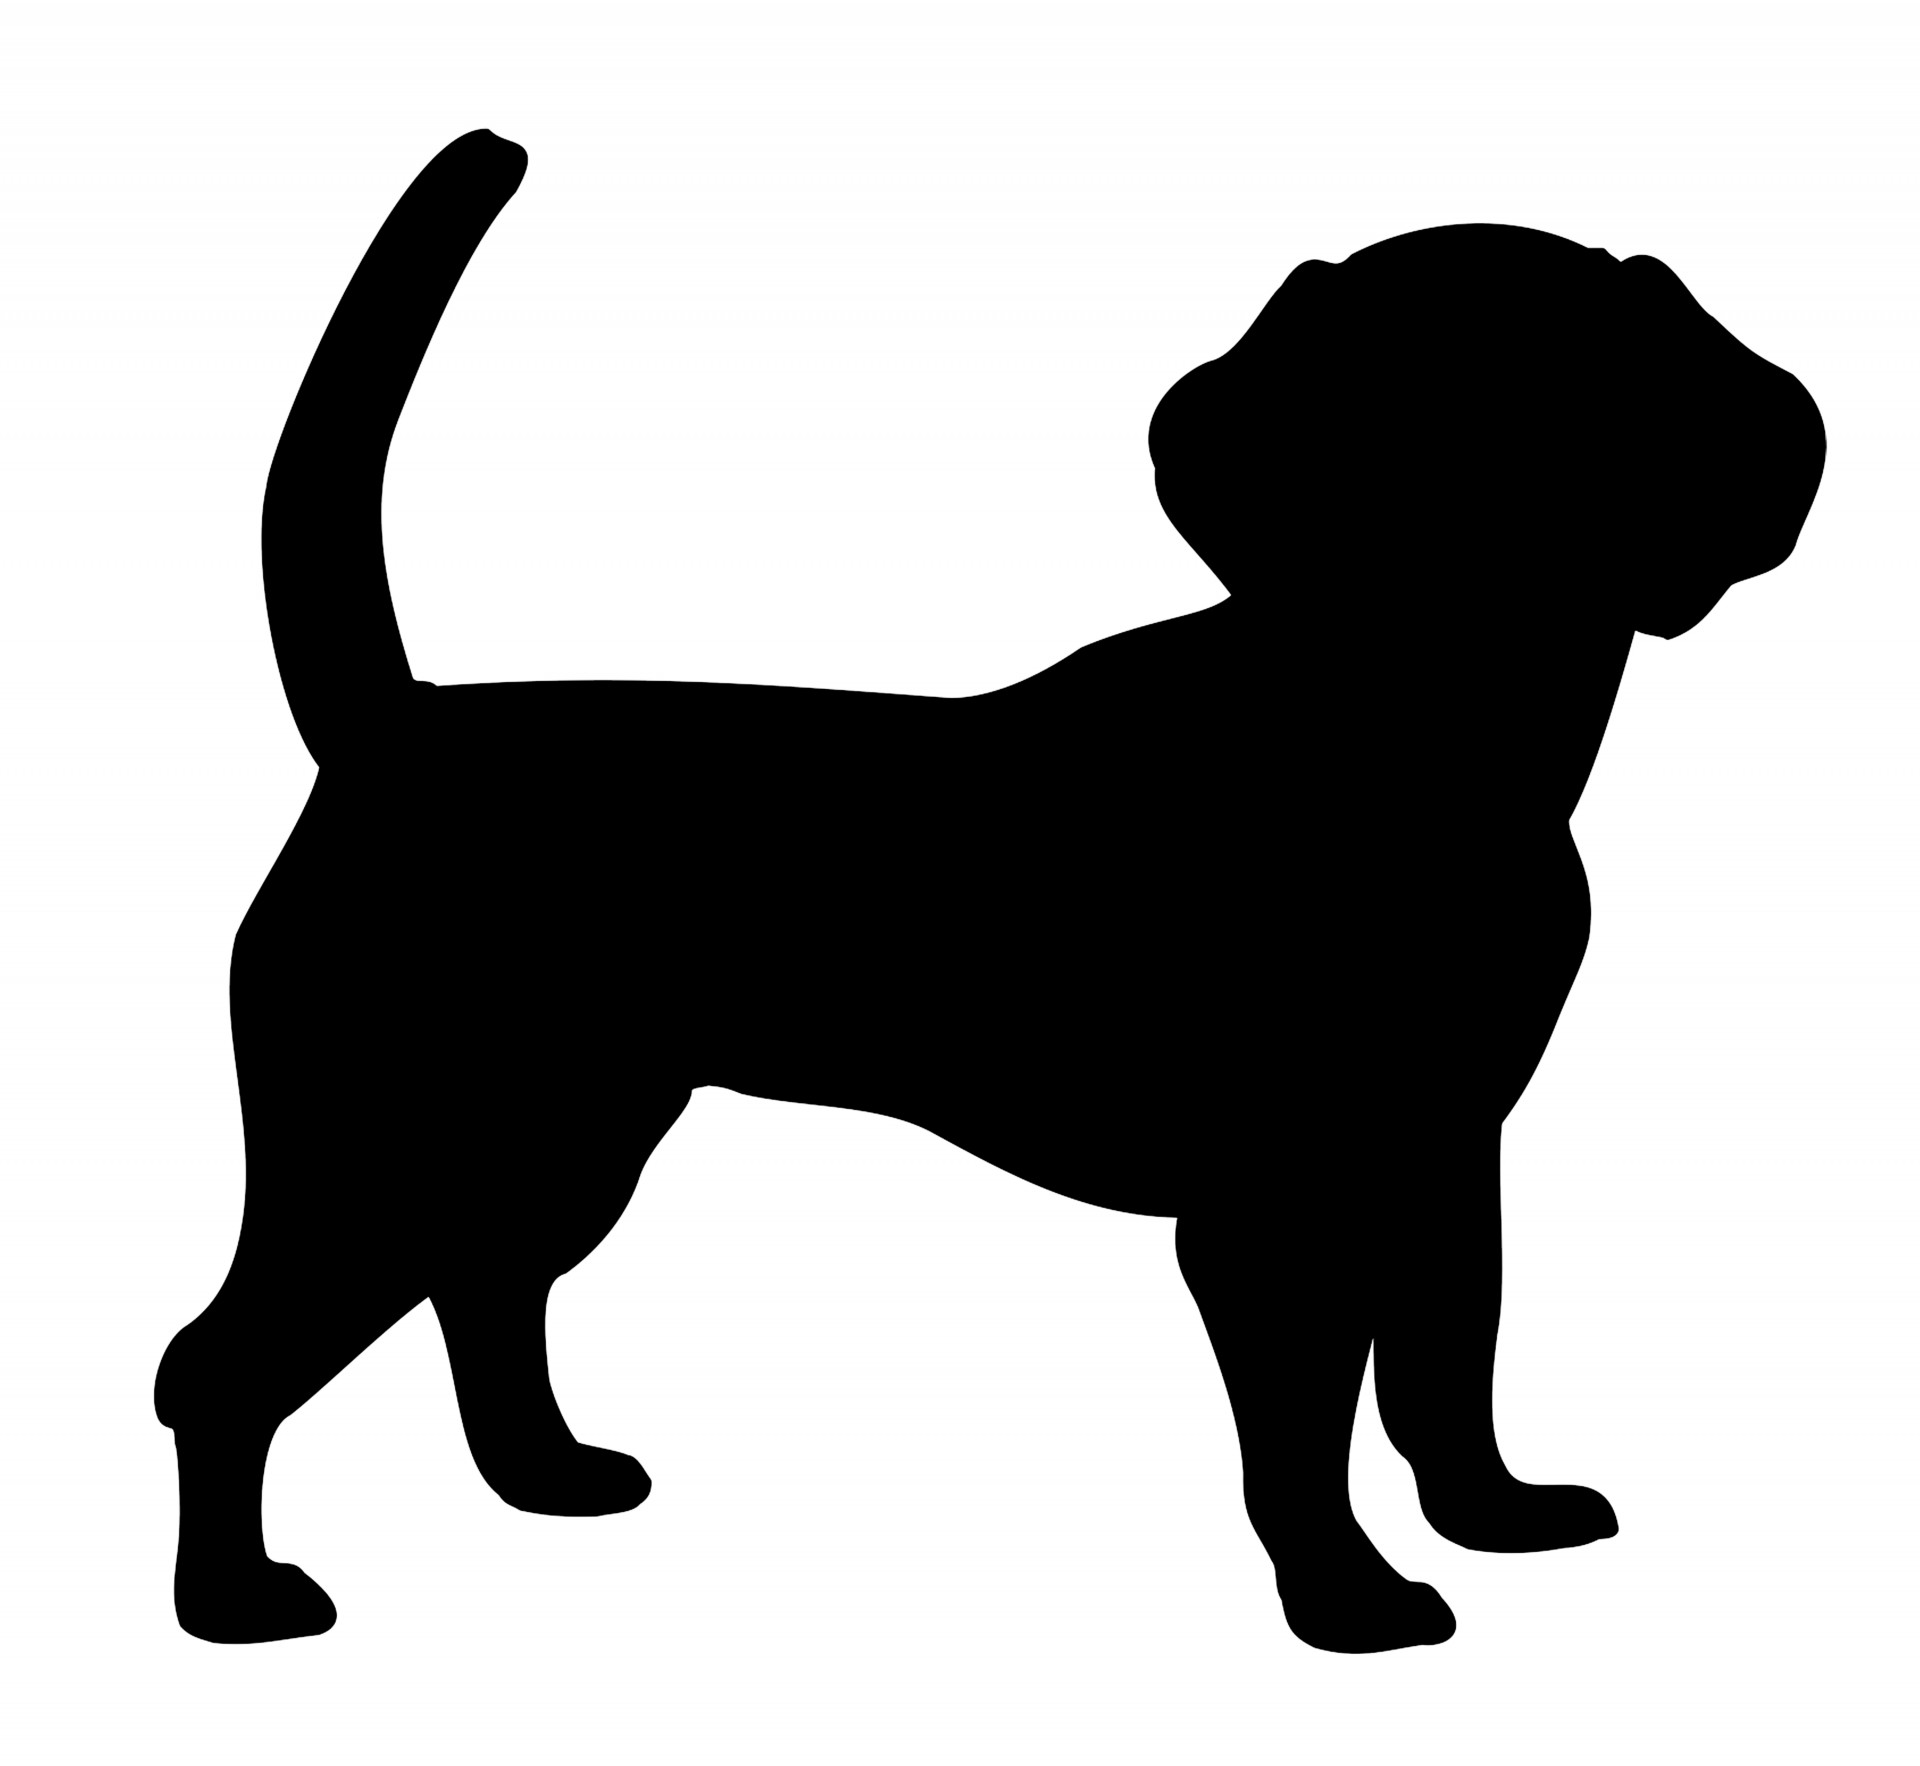 1920x1766 Dog Silhouette Free Stock Photo